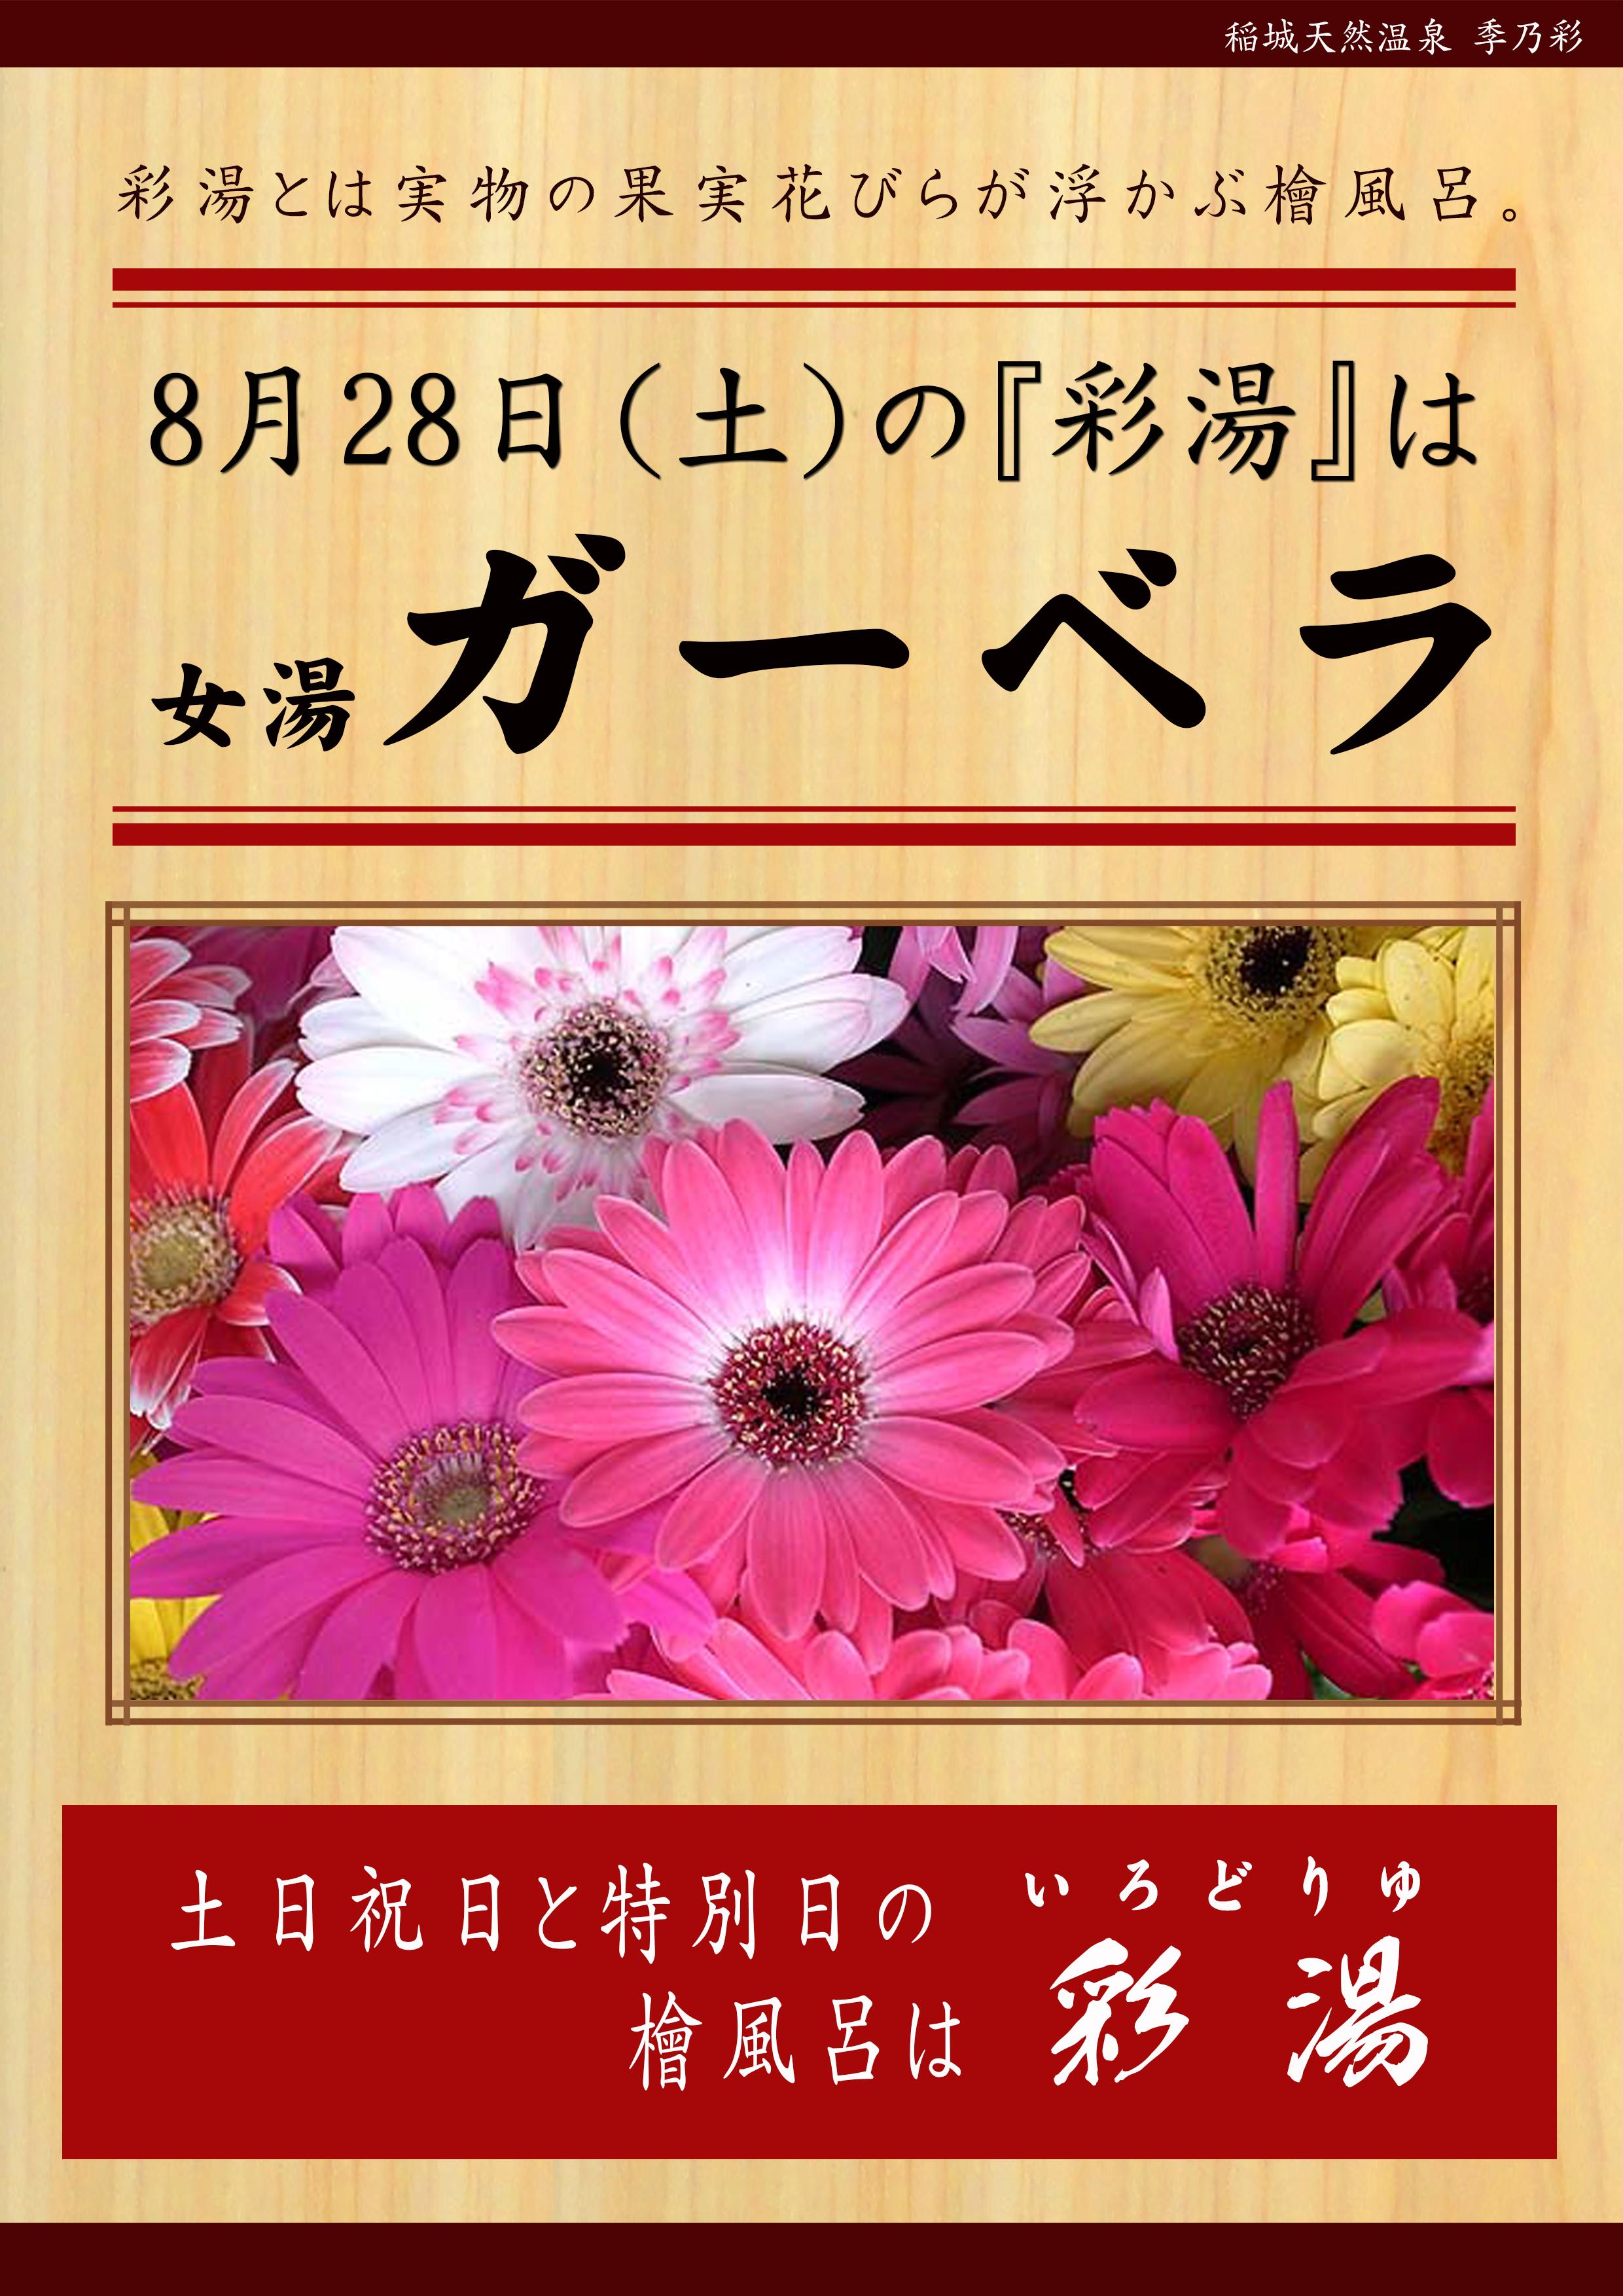 20210828 POP イベント 彩湯 女湯 ガーベラ